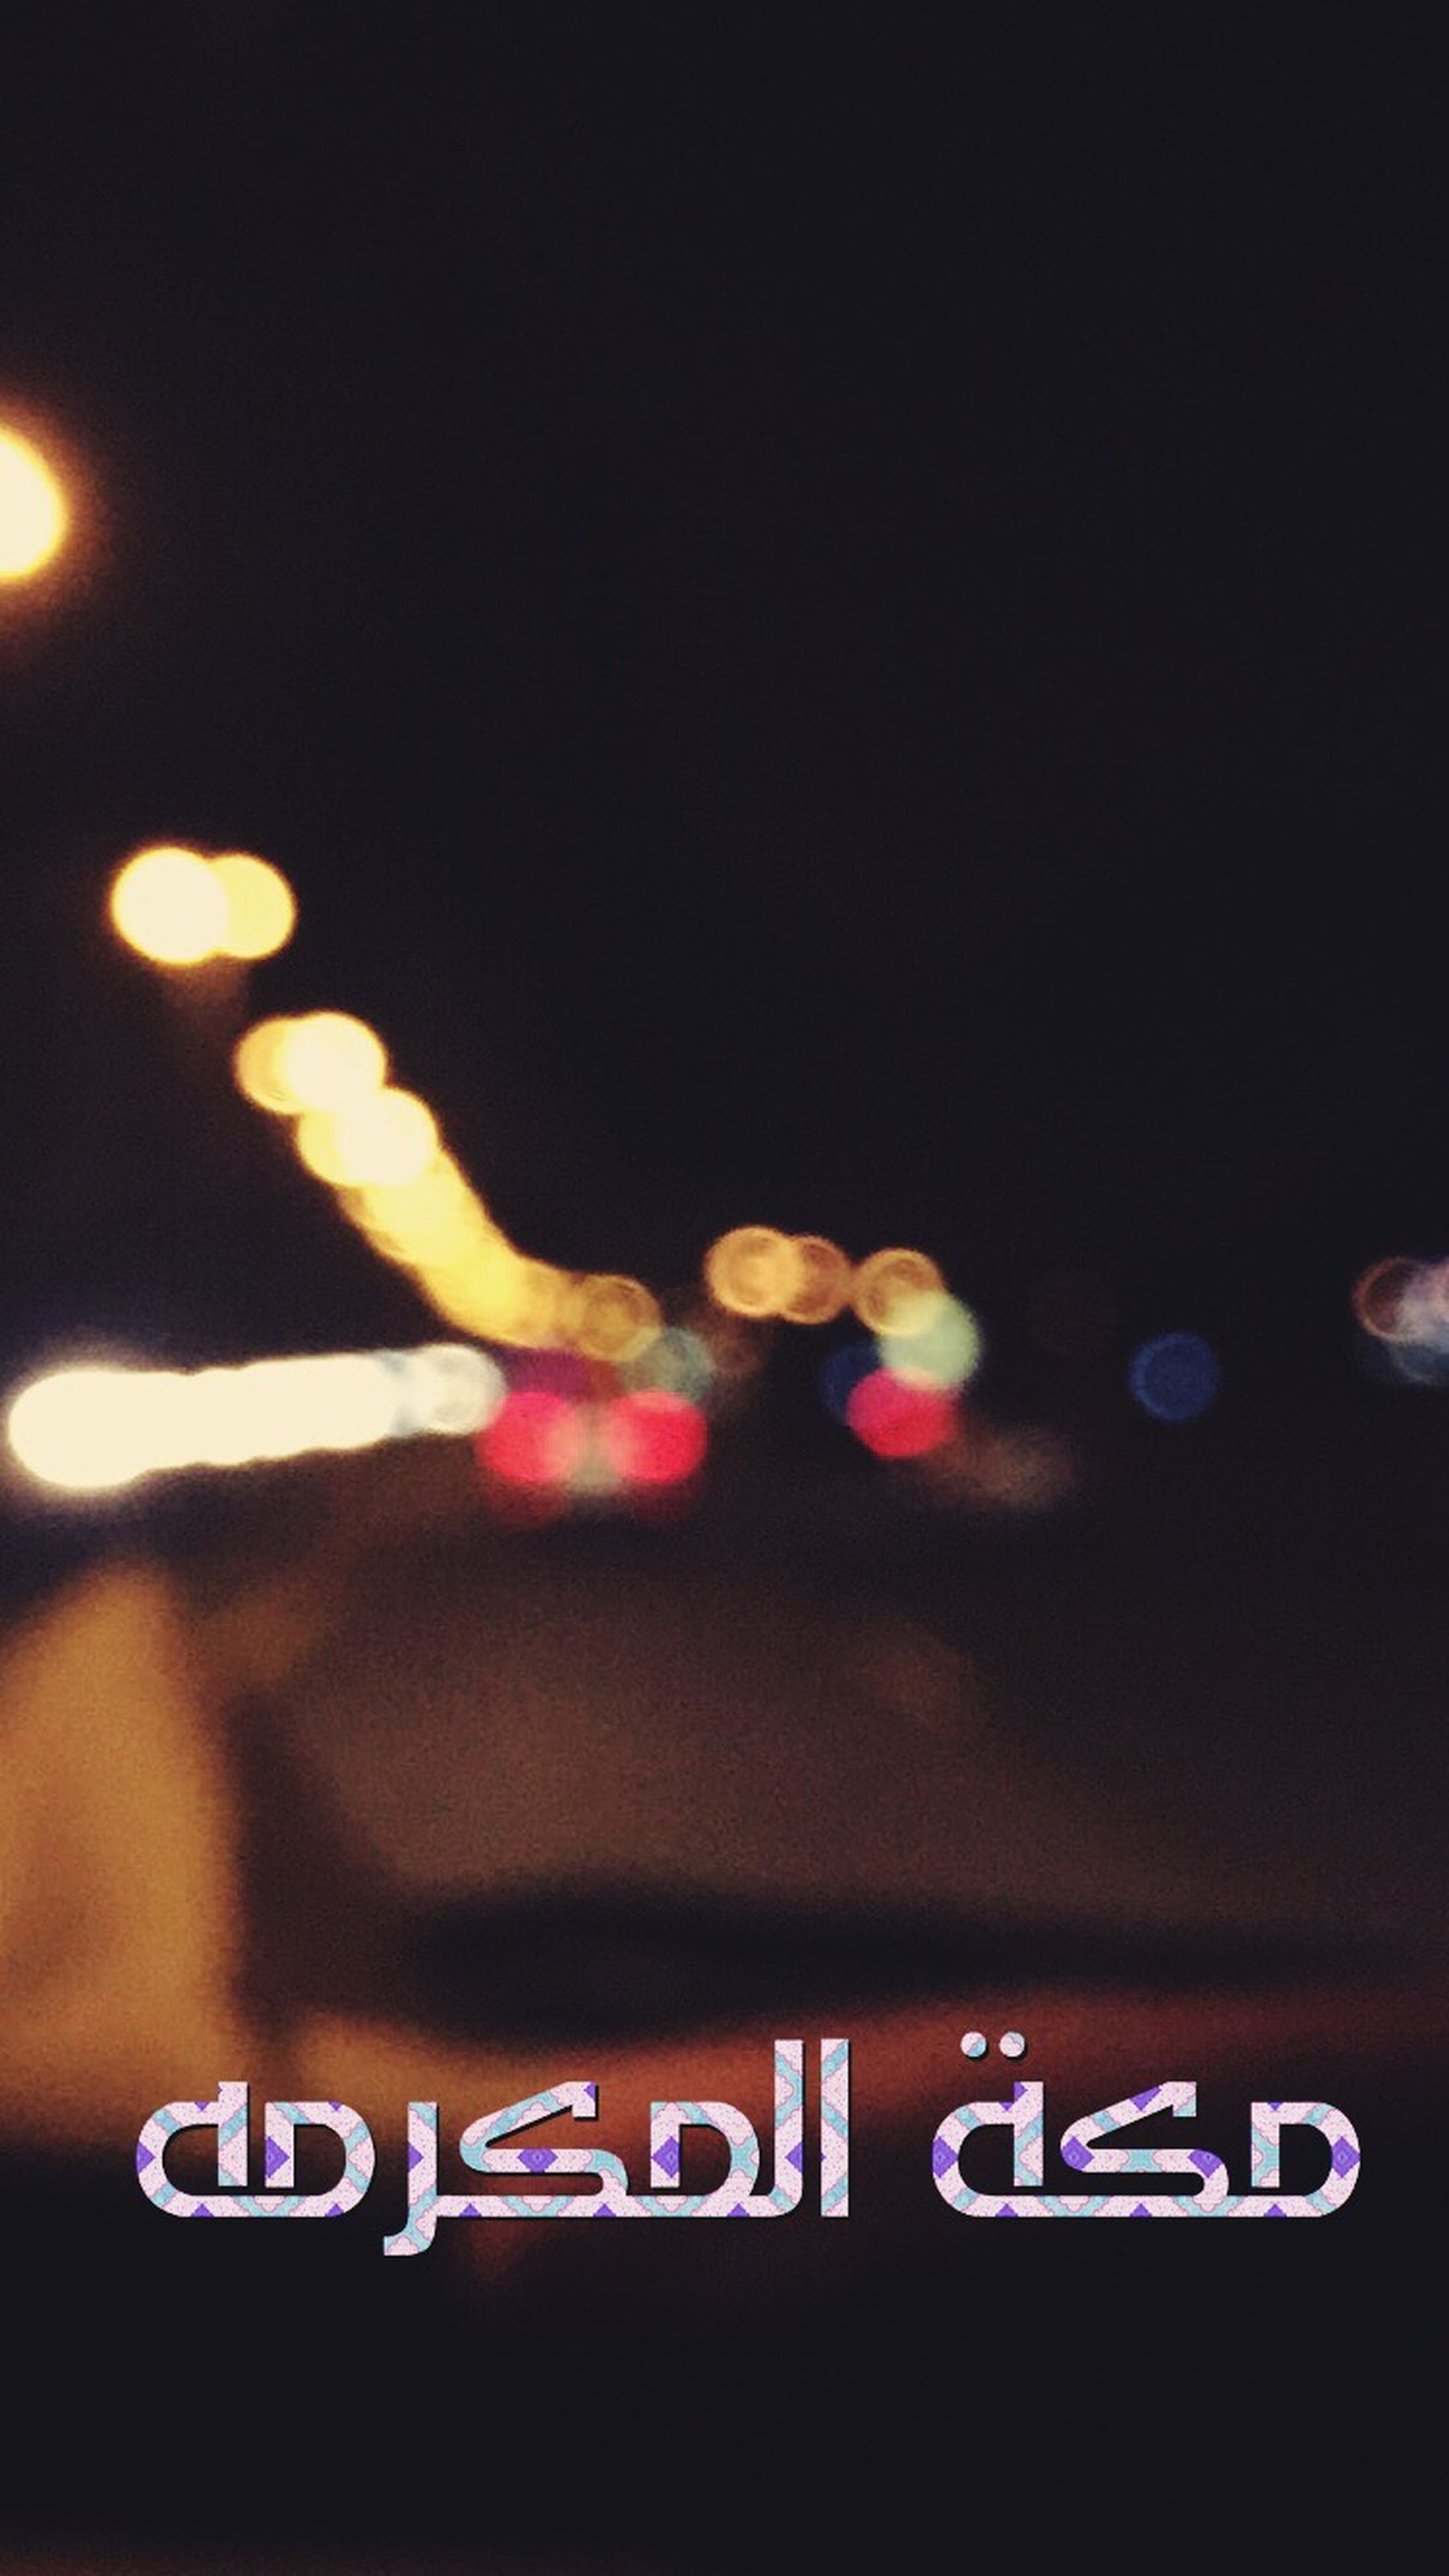 no people, illuminated, communication, night, close-up, indoors, casino